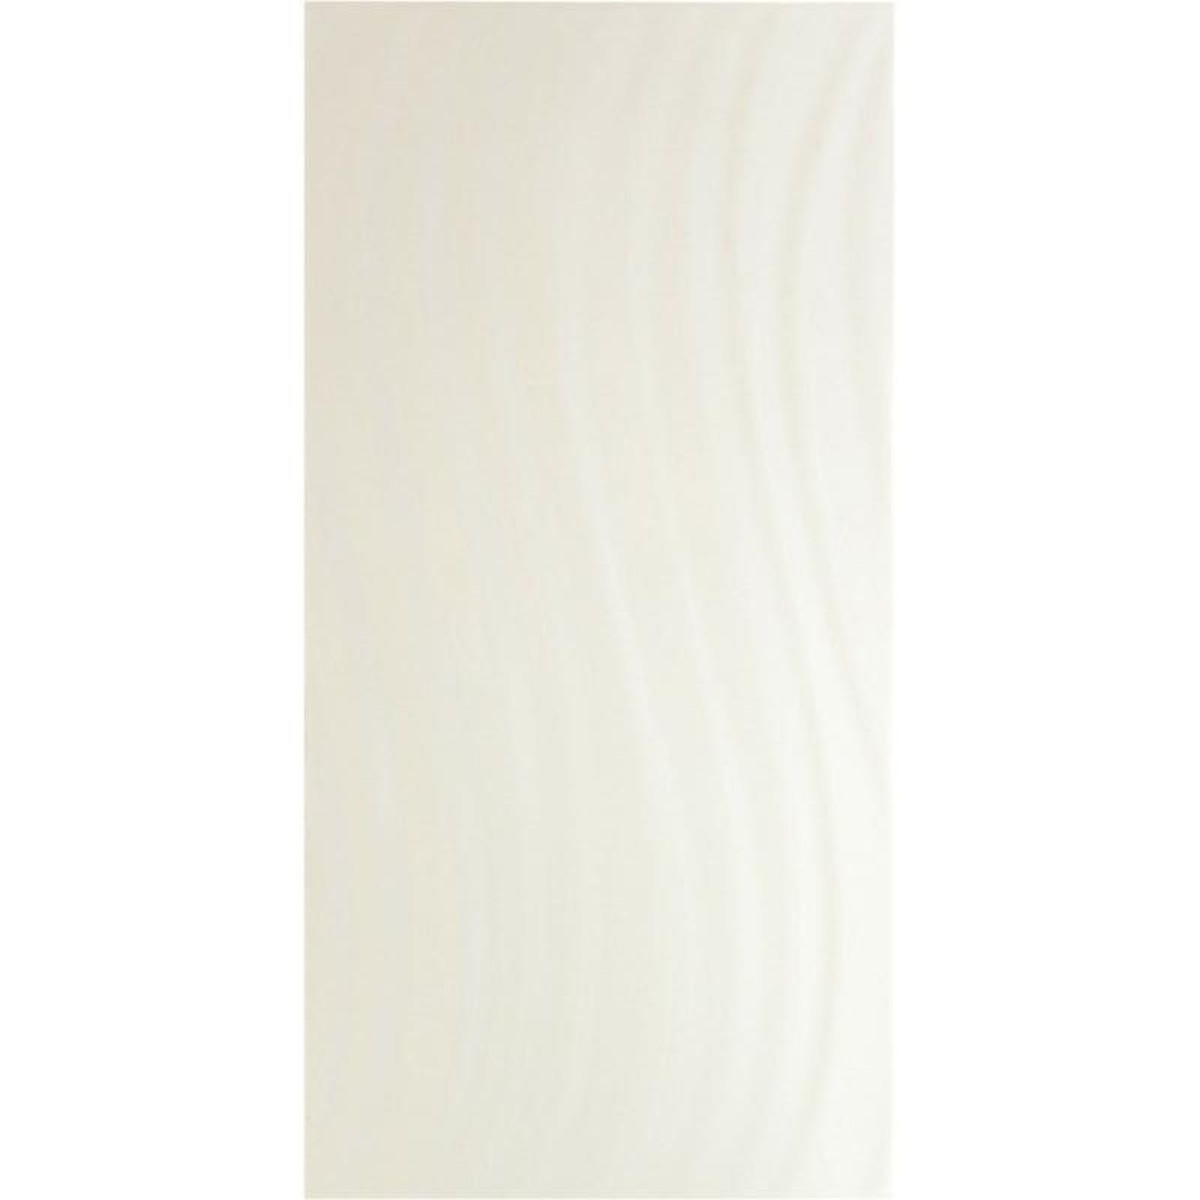 Плитка настенная Fortuna GT 39.8х19.8 см 1.58 м2 цвет белый